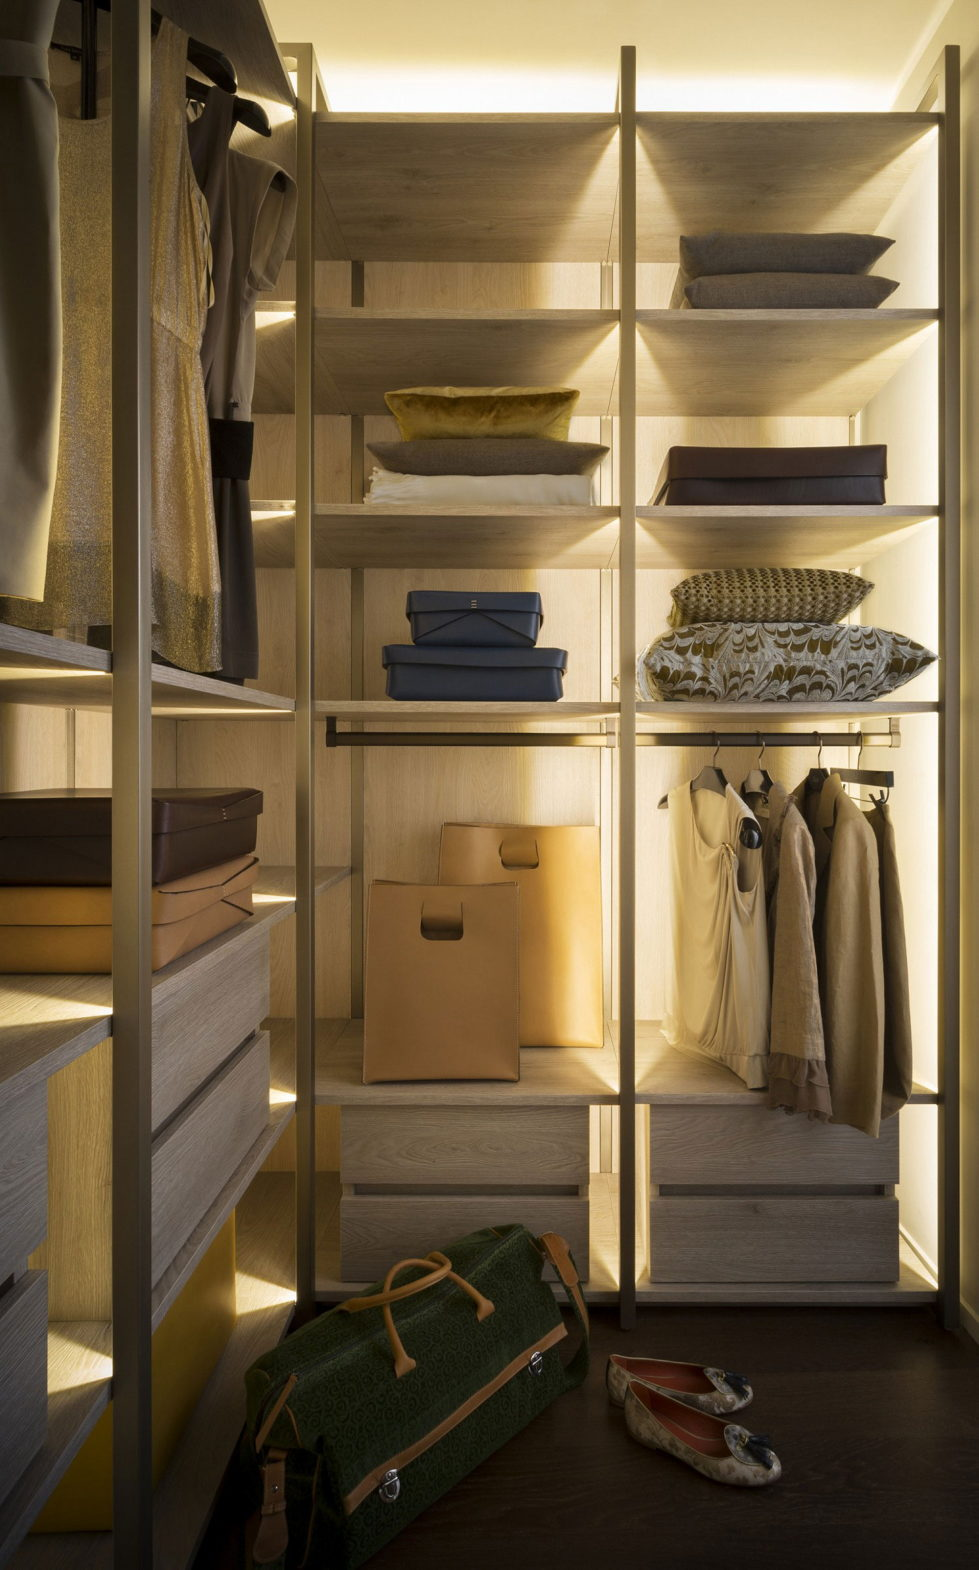 The luxury Citylife apartment from Matteo Nunziati, Milan, Italy 21